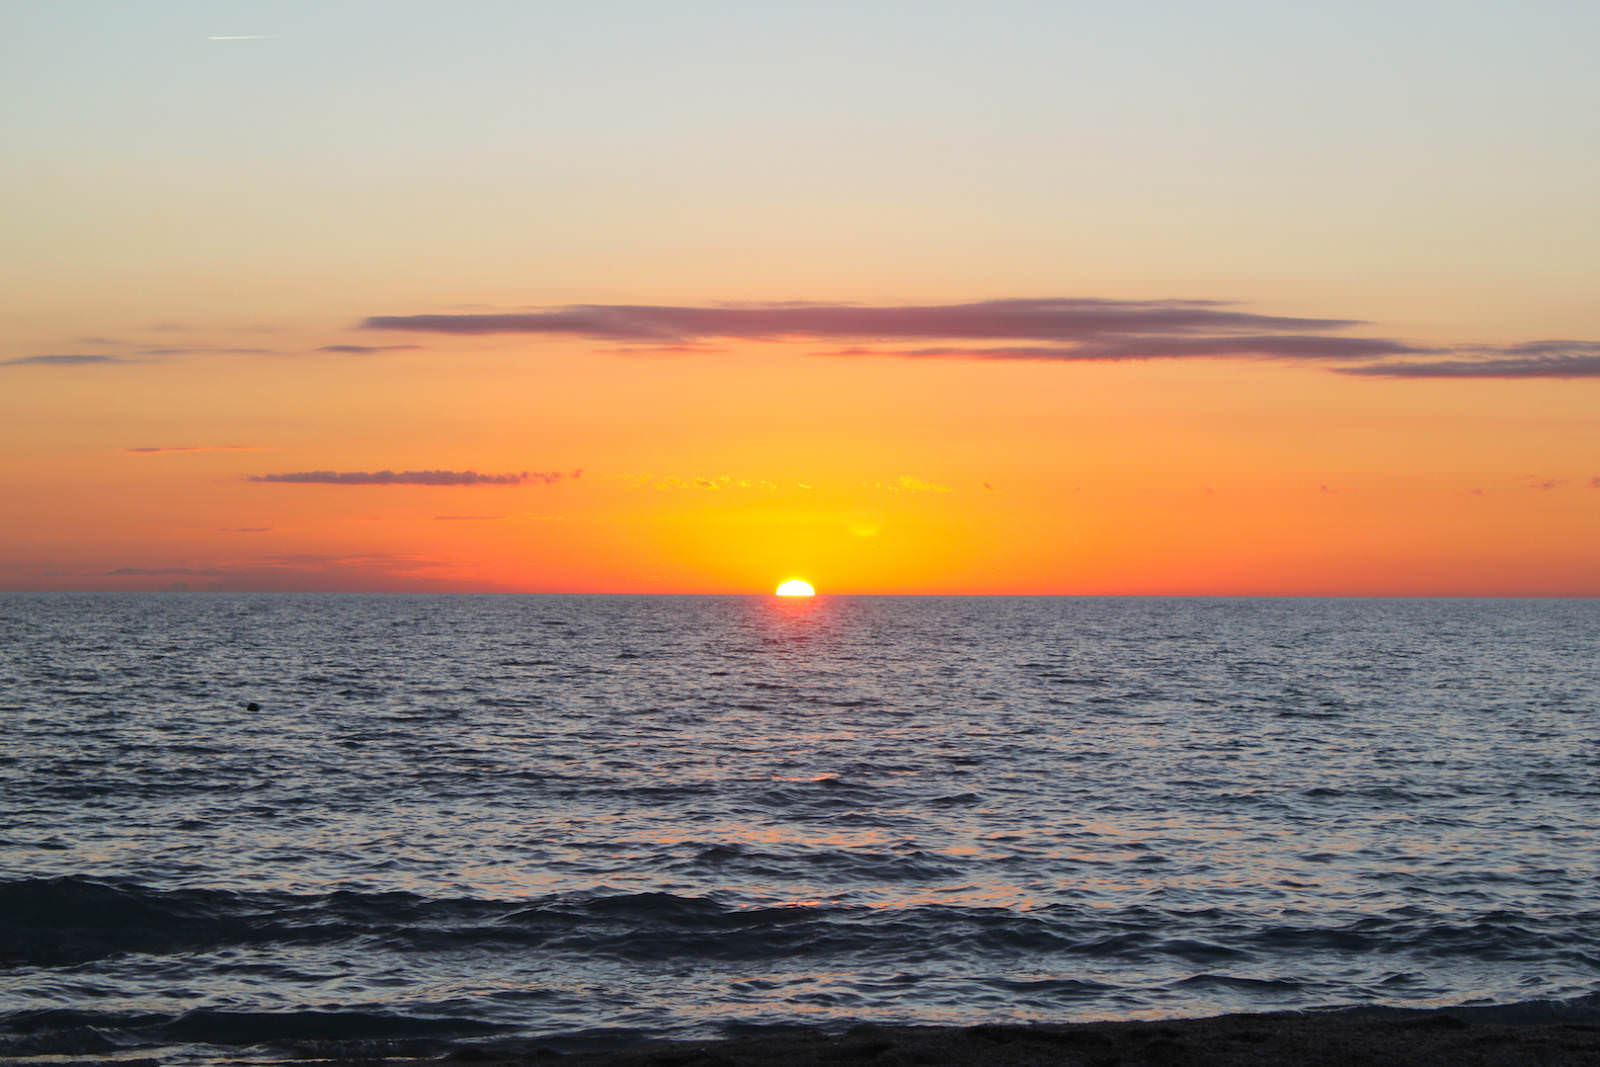 Gulf of Mexico sunset Florida USA. Must Do Visitor Guides, MustDo.com